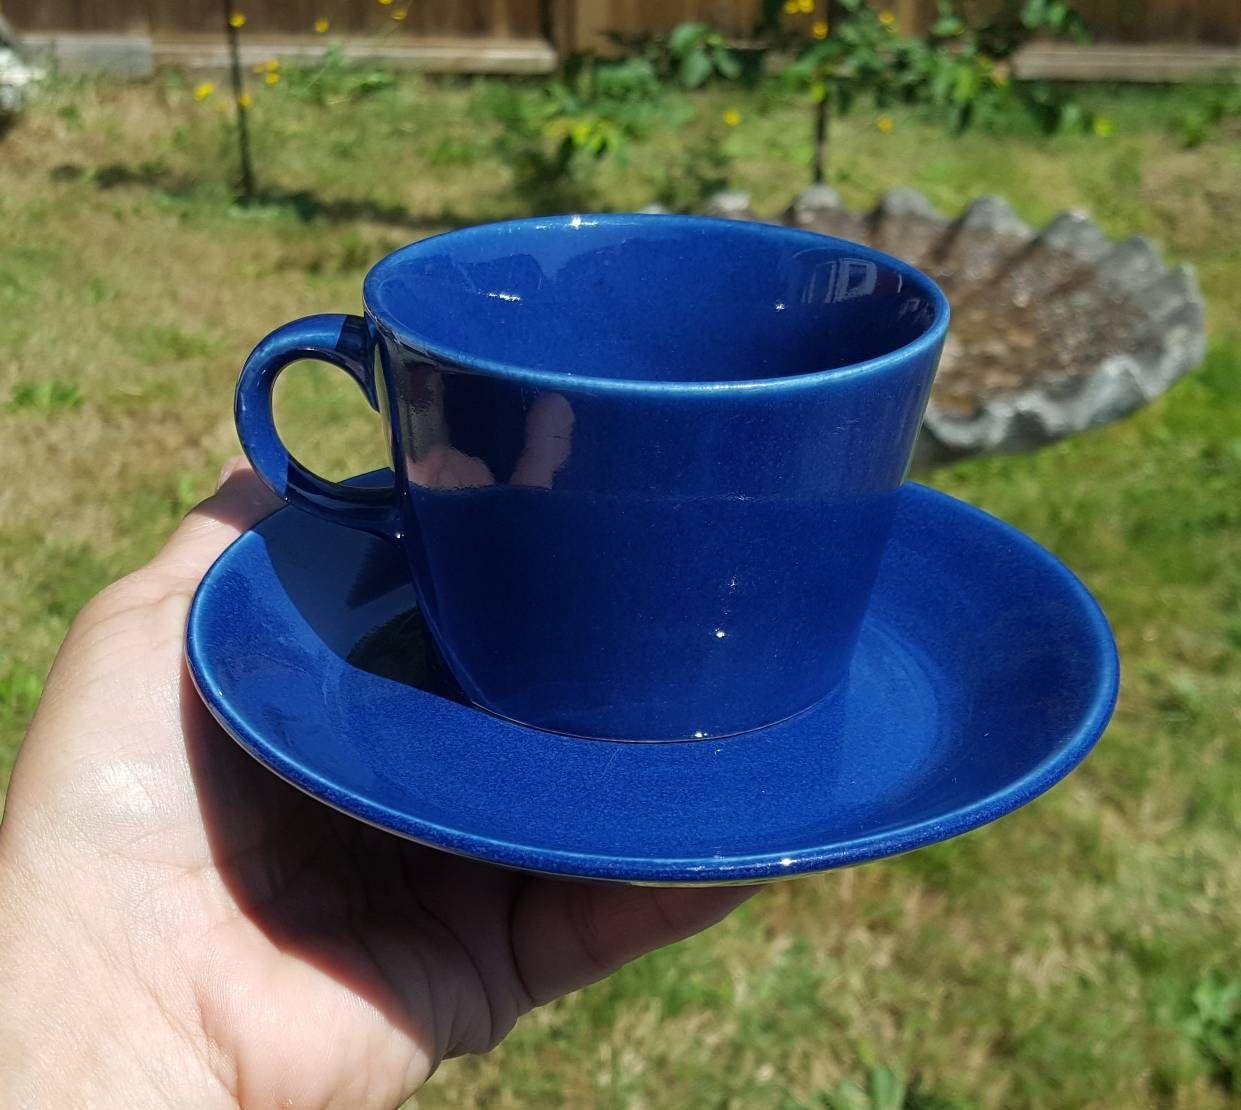 Arabia Finland Kilta Coffee Cup designed by Kaj Franck